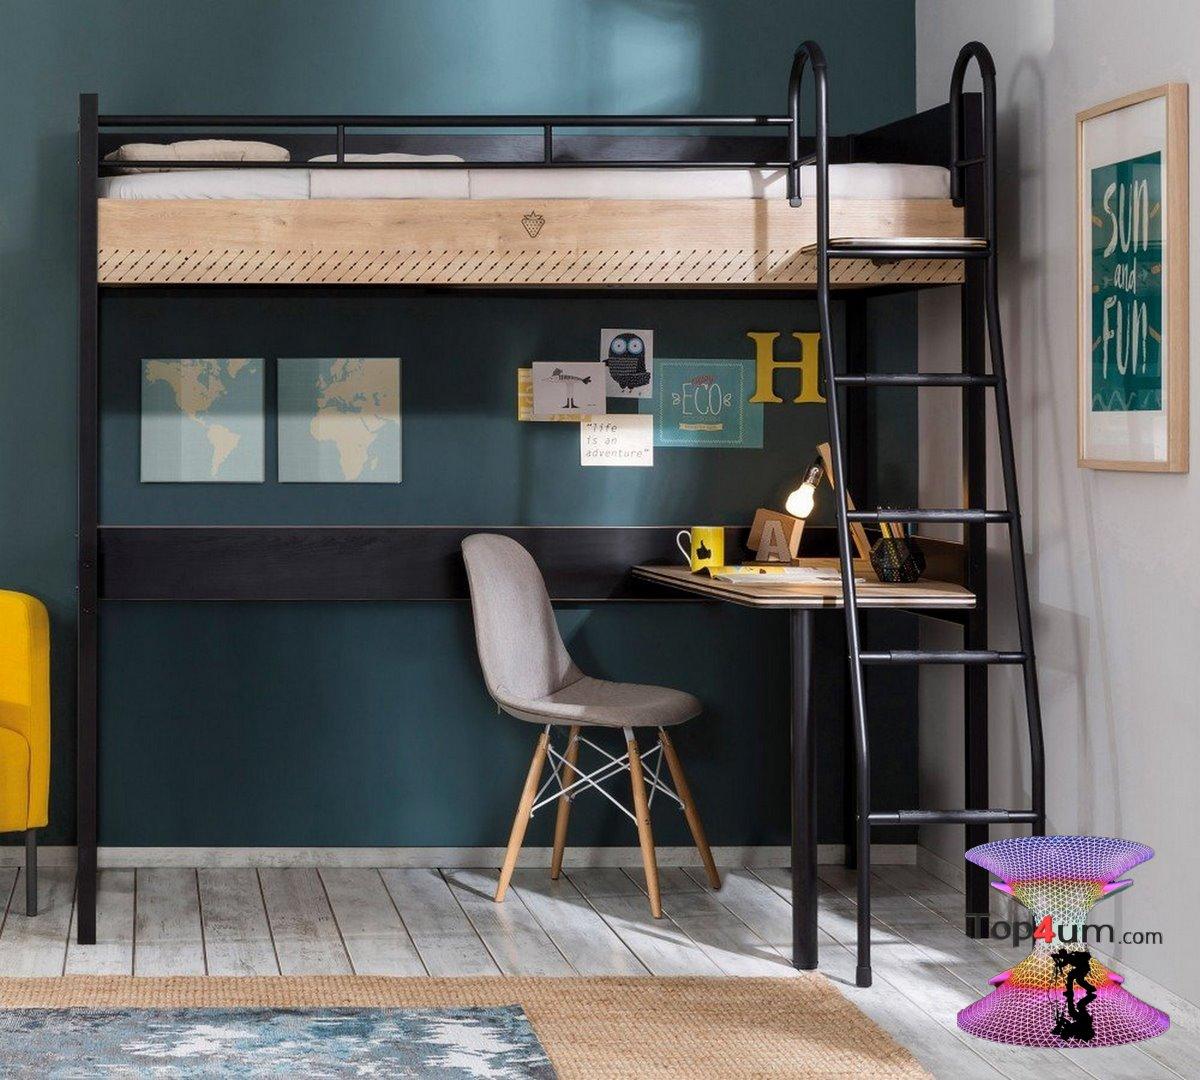 f:id:kitchendesignsegypt:20191020021813j:plain